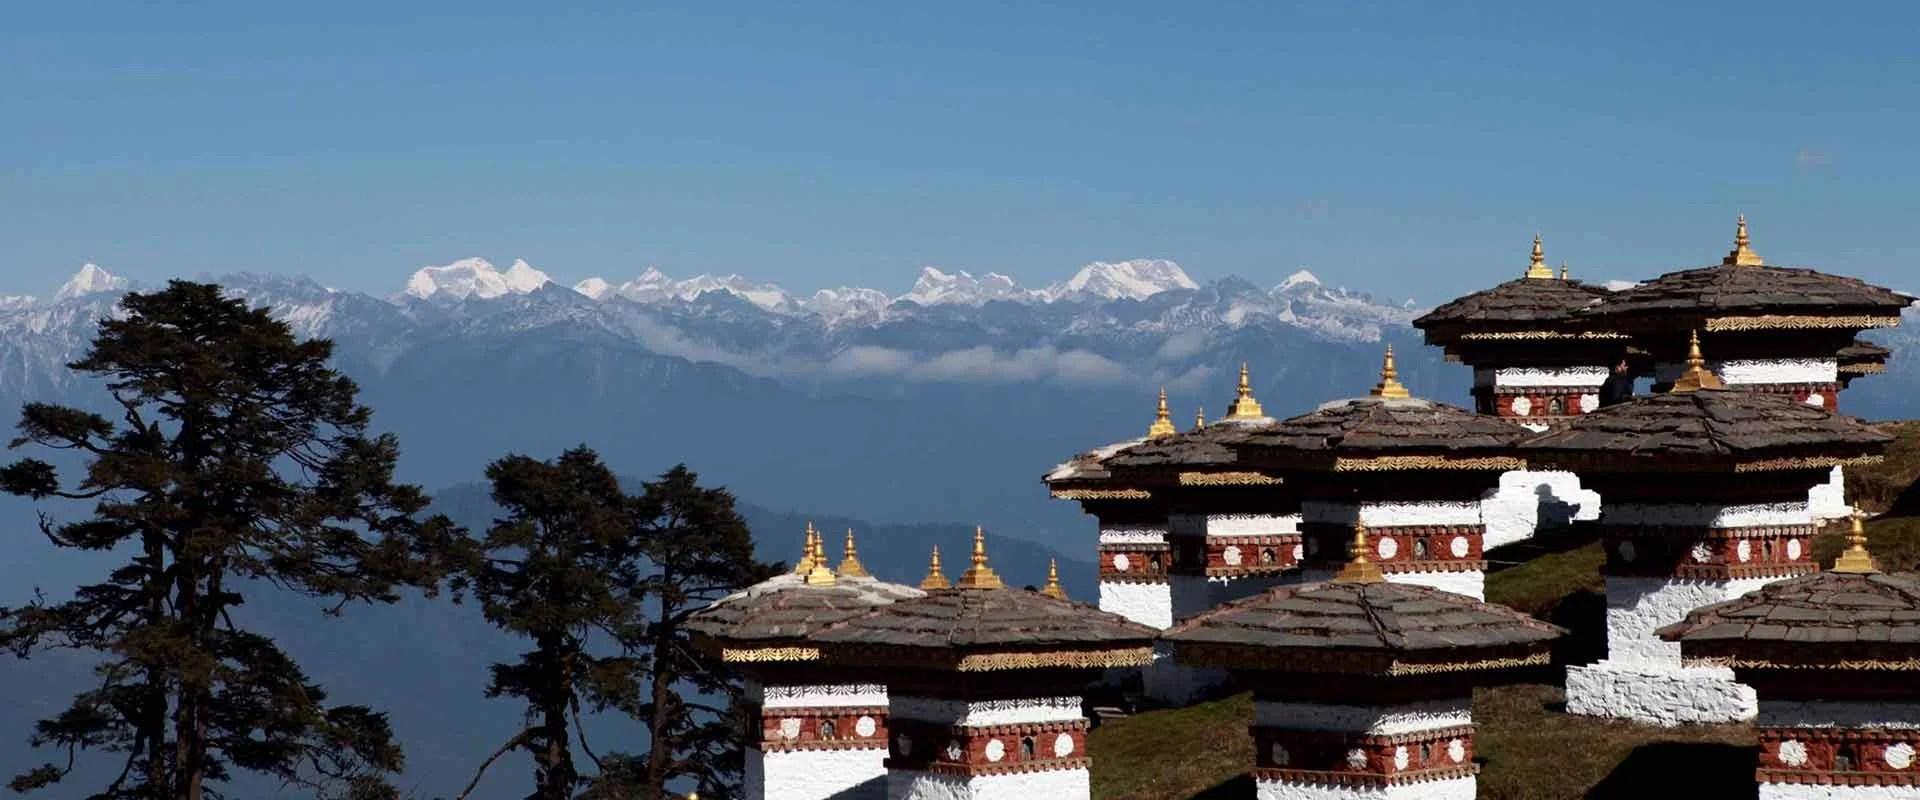 Glimpse of Bhutan, Culture Tour Holidays in Bhutan